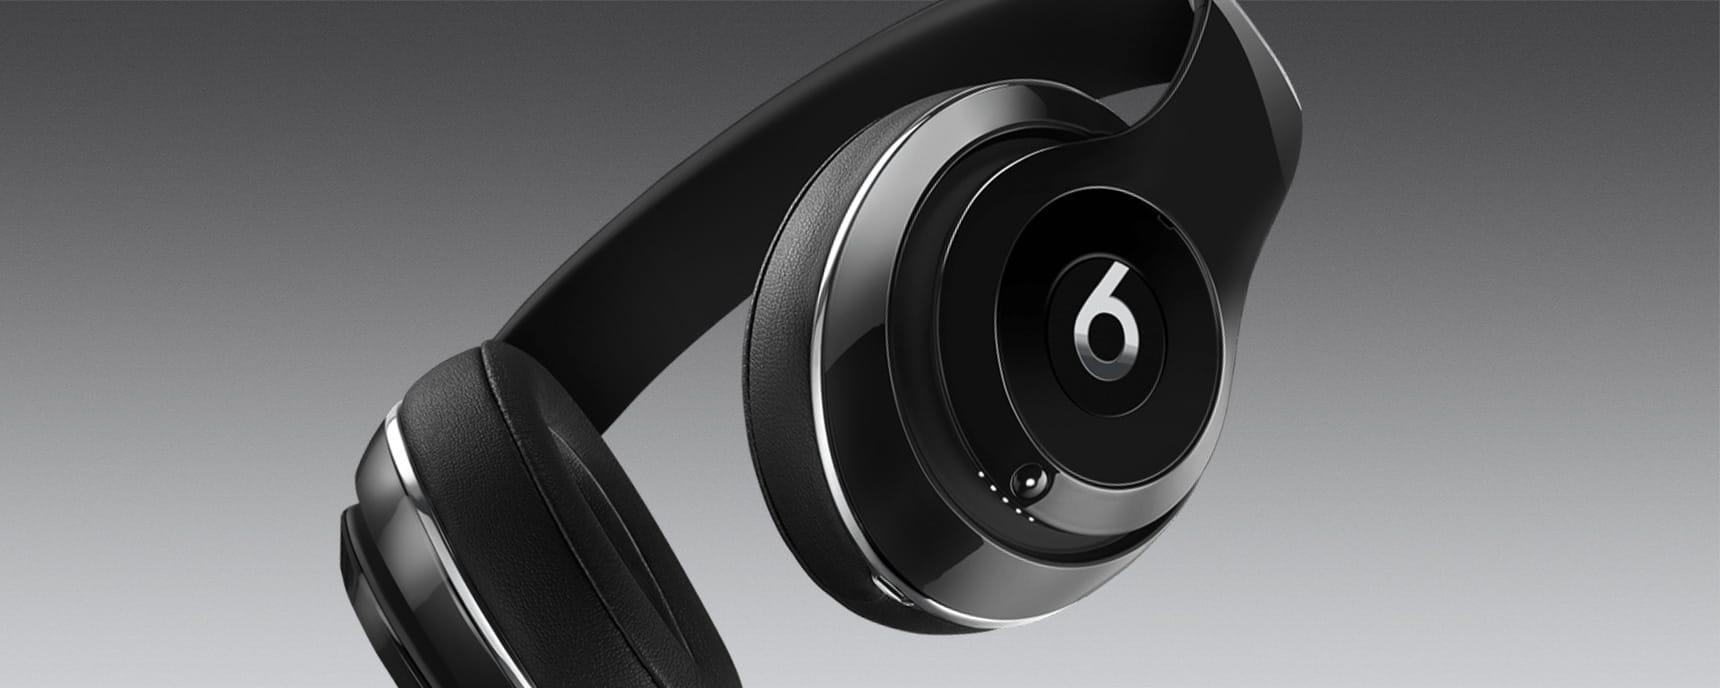 1472667704-pcp_headphone_disruptor_1720x688